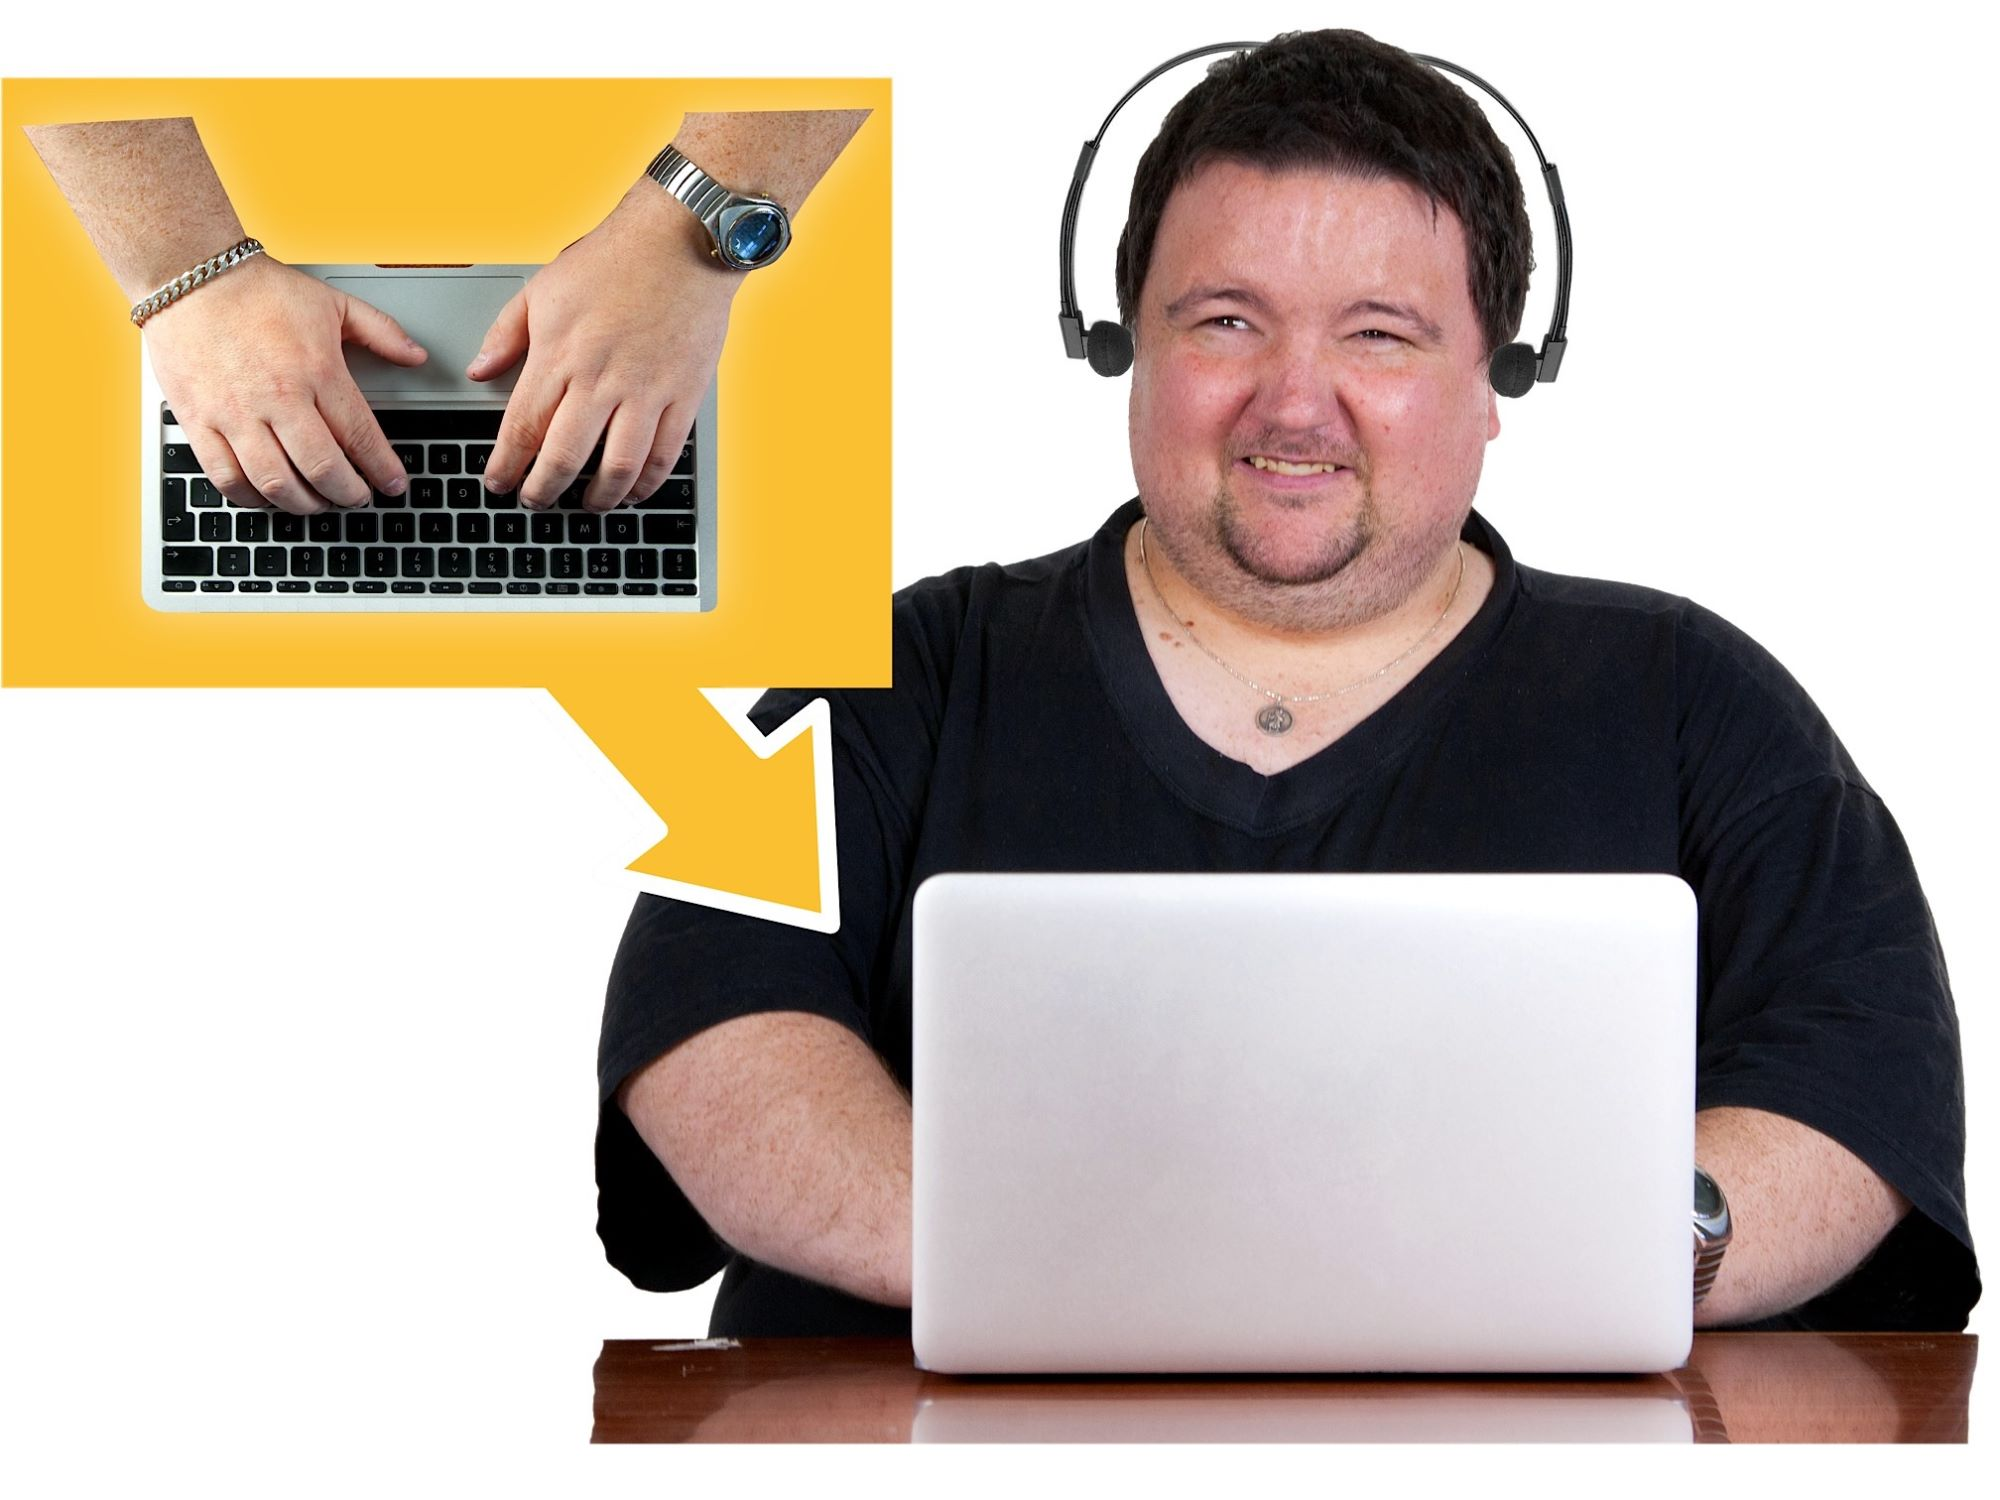 Audio-typist